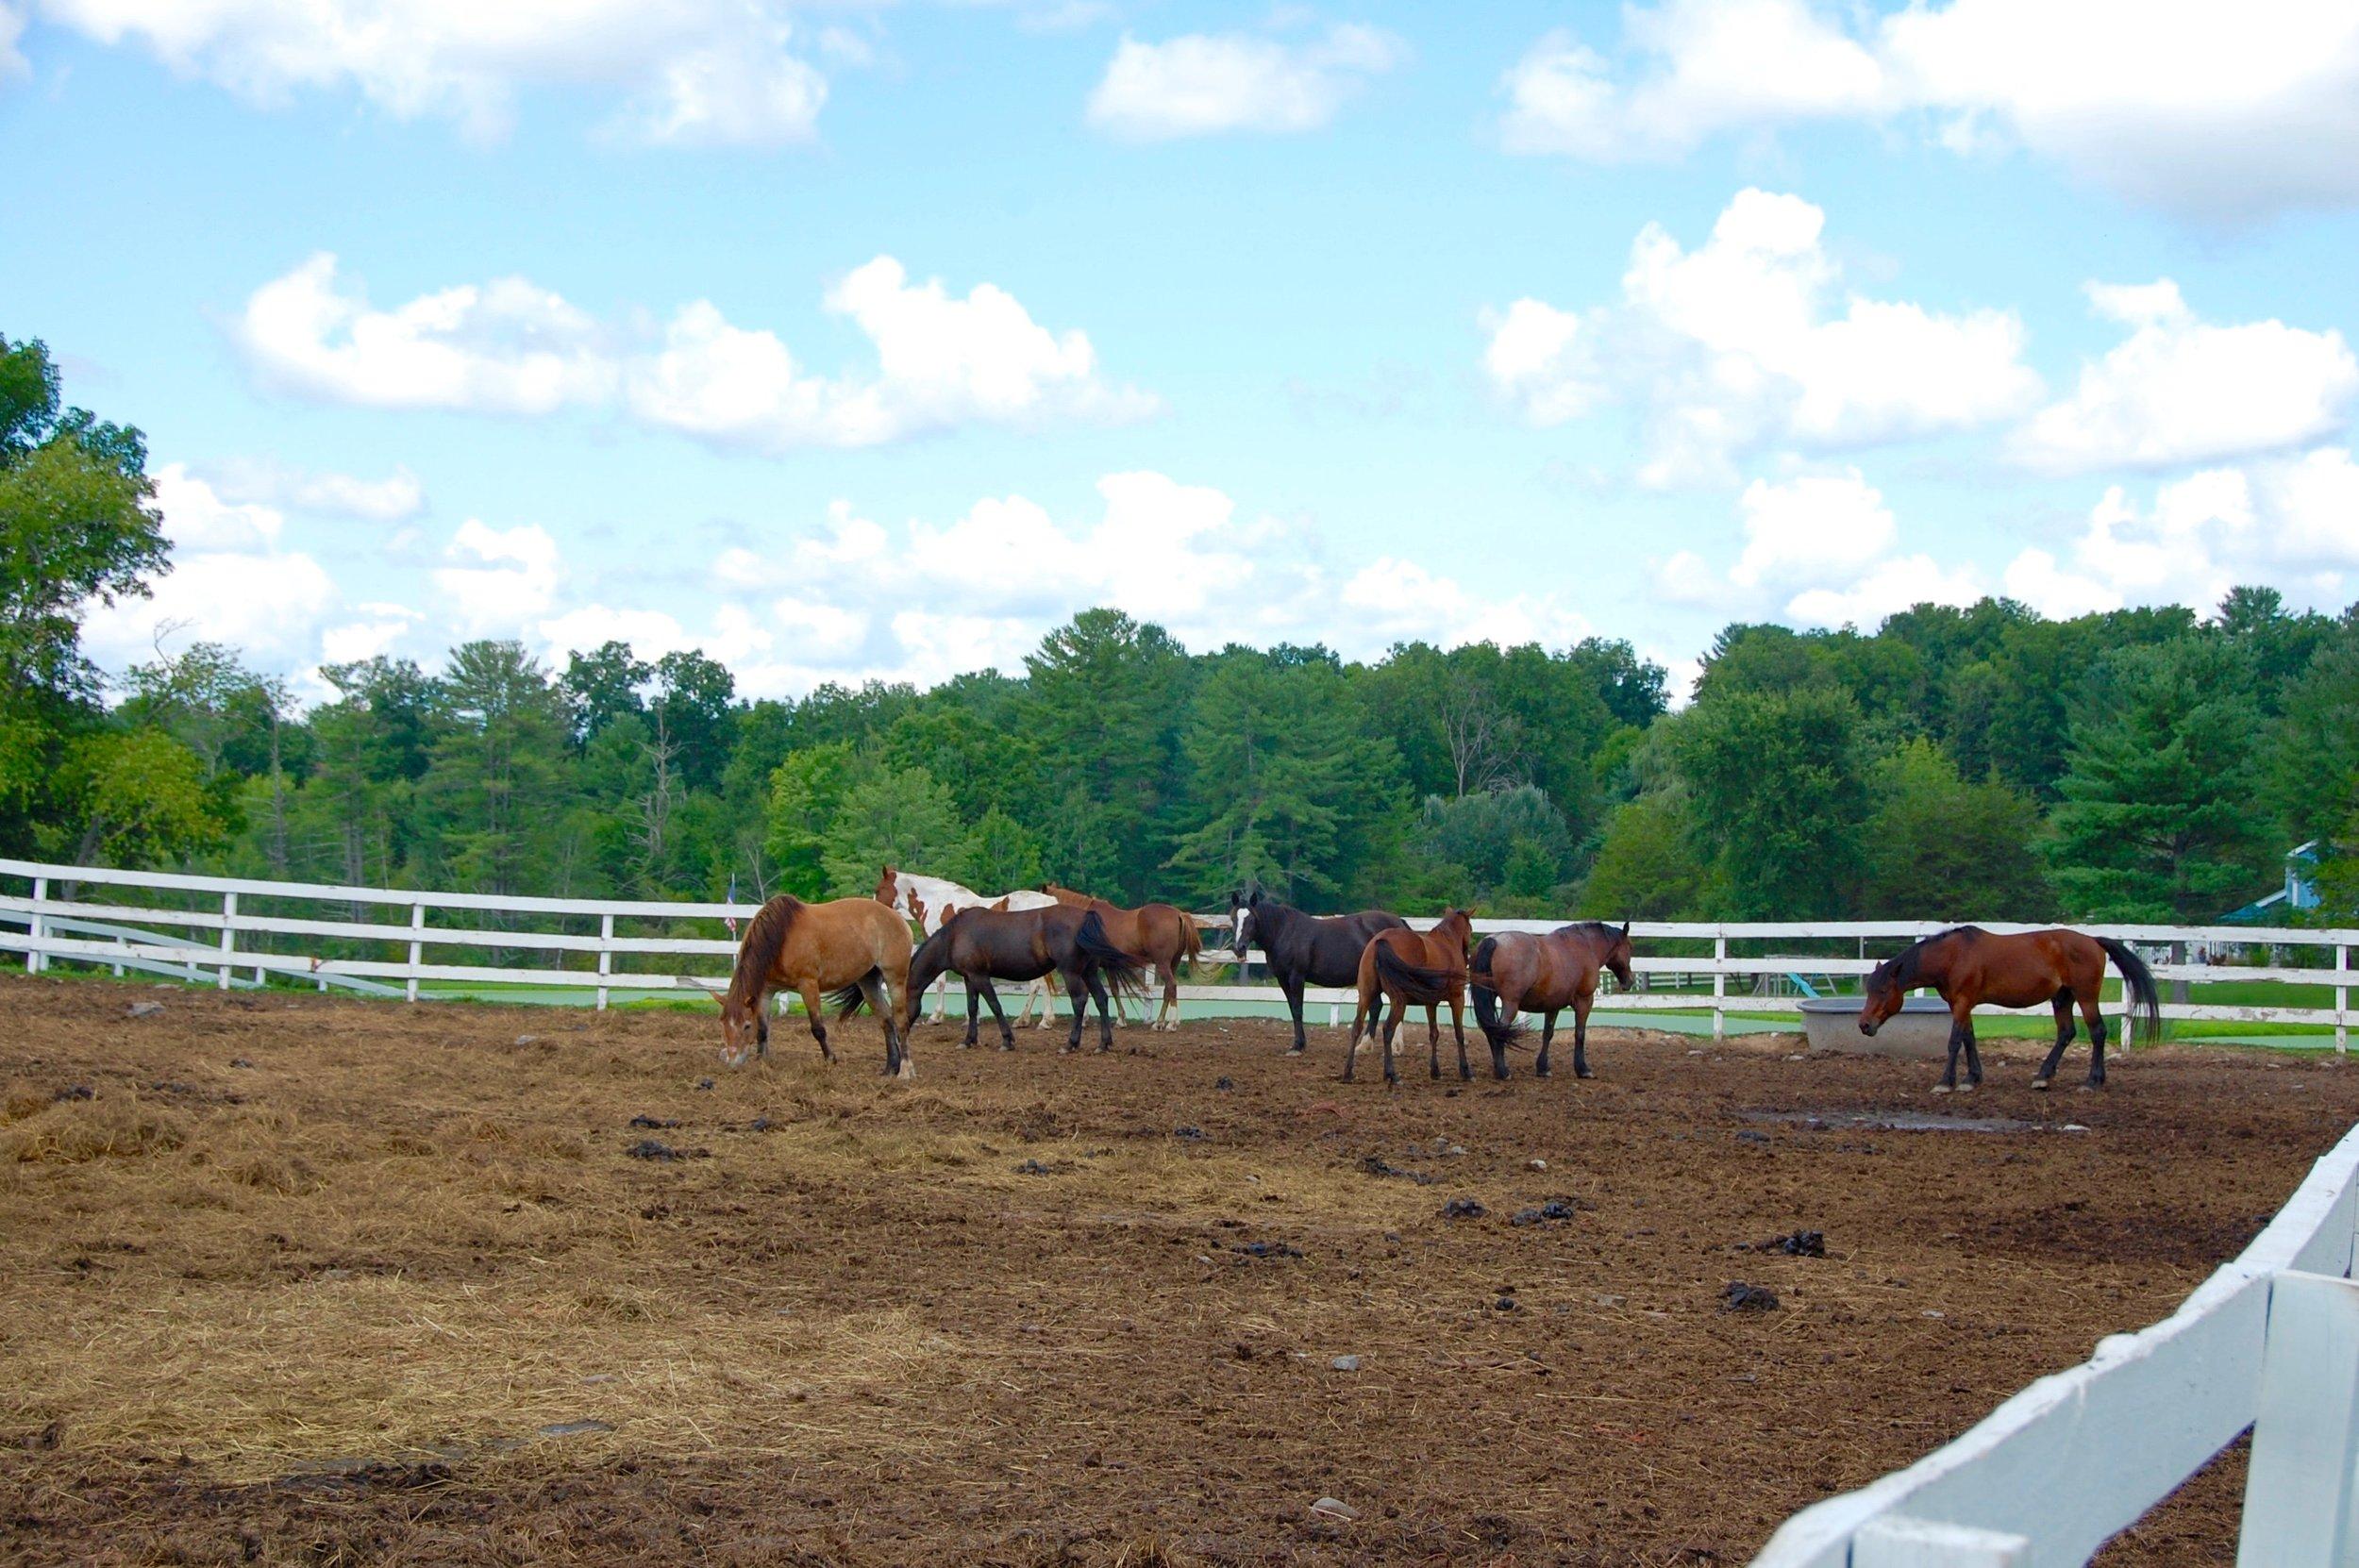 horseback riding in east durham, ny